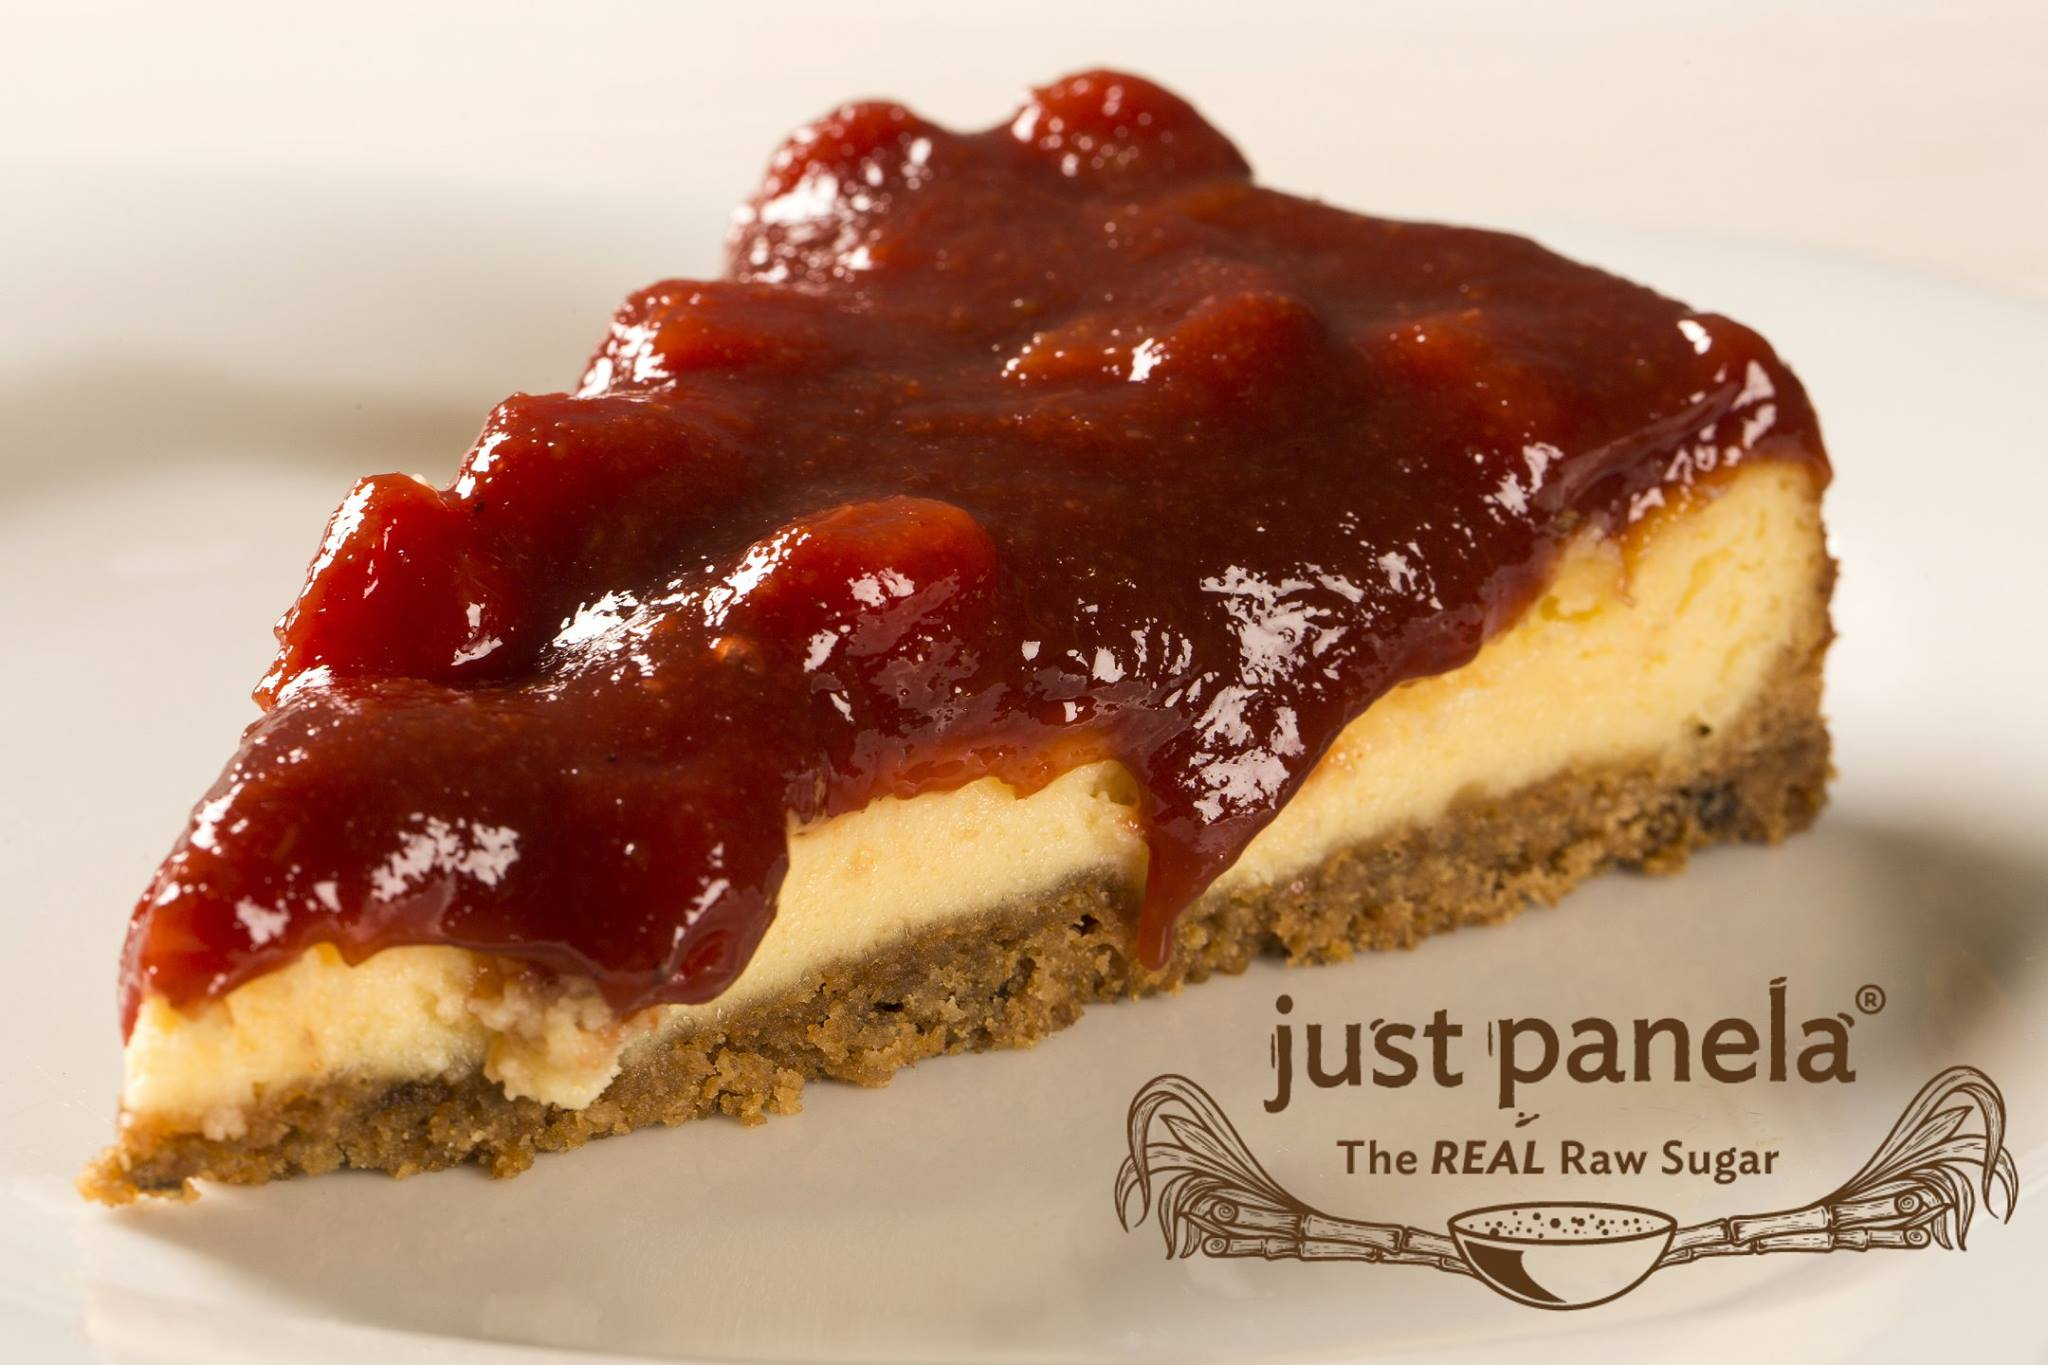 Just Panela Guava Lemon Strawberry Cheesecake -